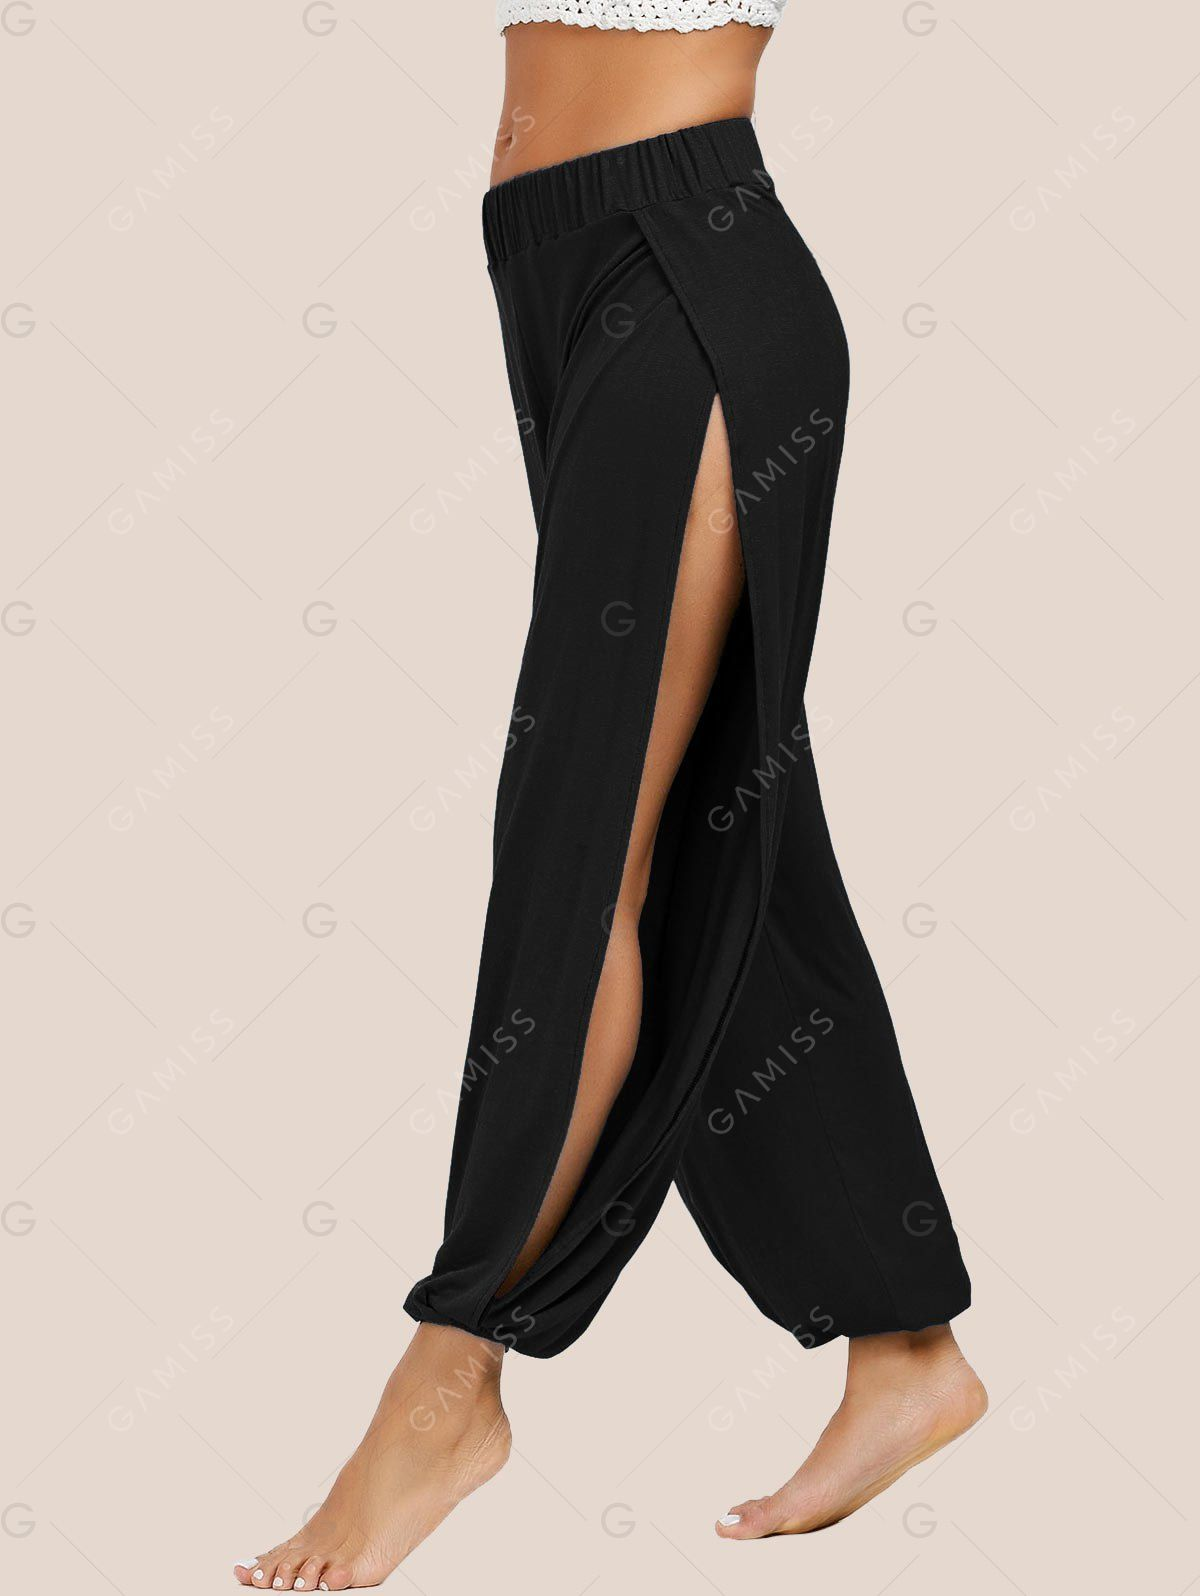 c29c360a68820 Slit Elastic Waist Harem Pants in 2019 | boho patterns | Yoga pants ...